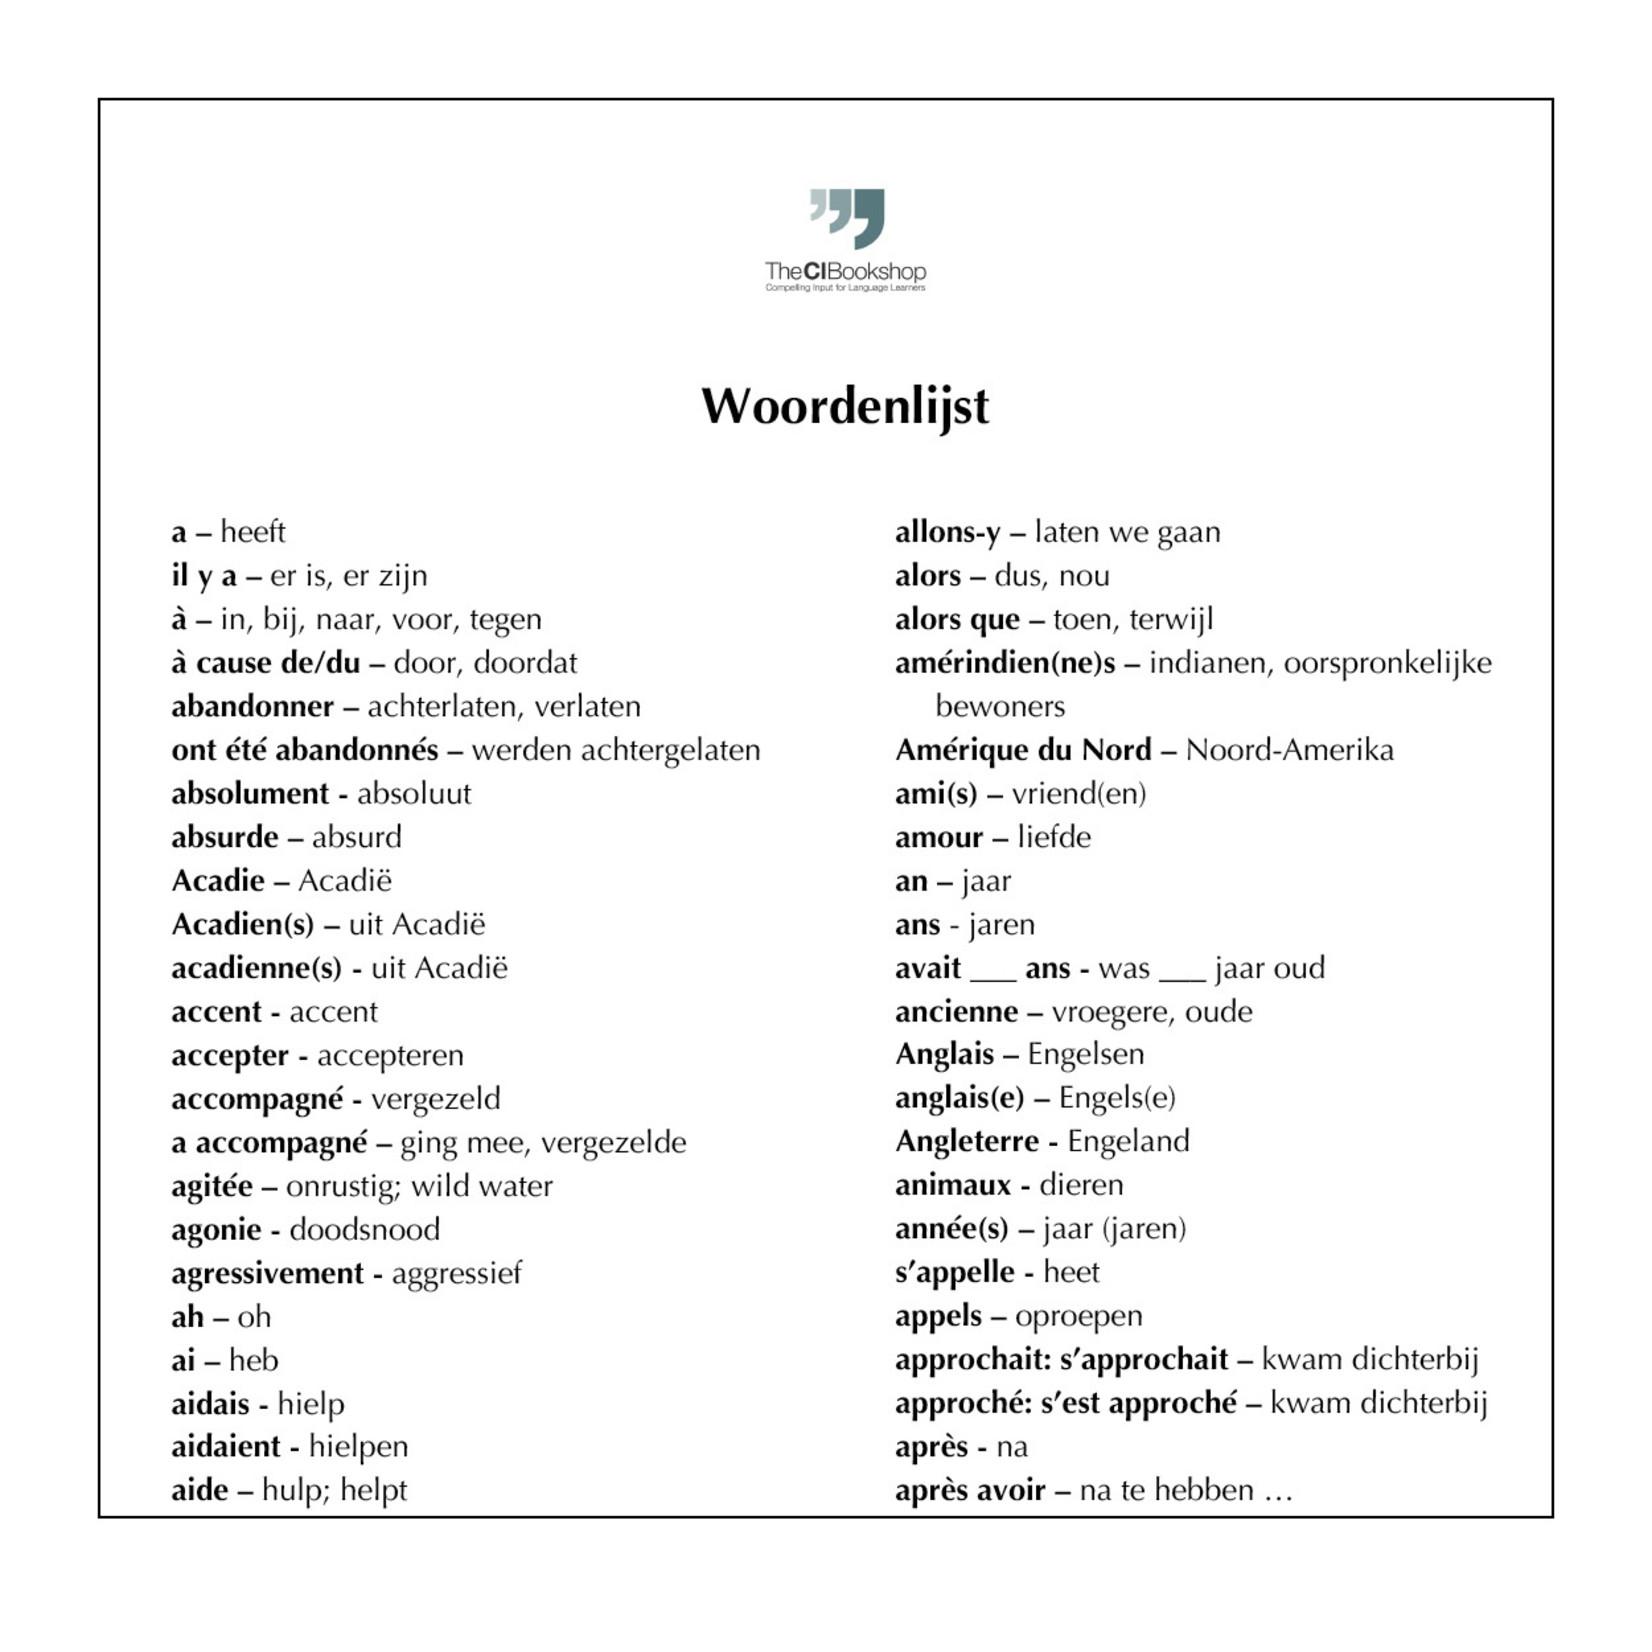 Dutch glossary for Les trois amis